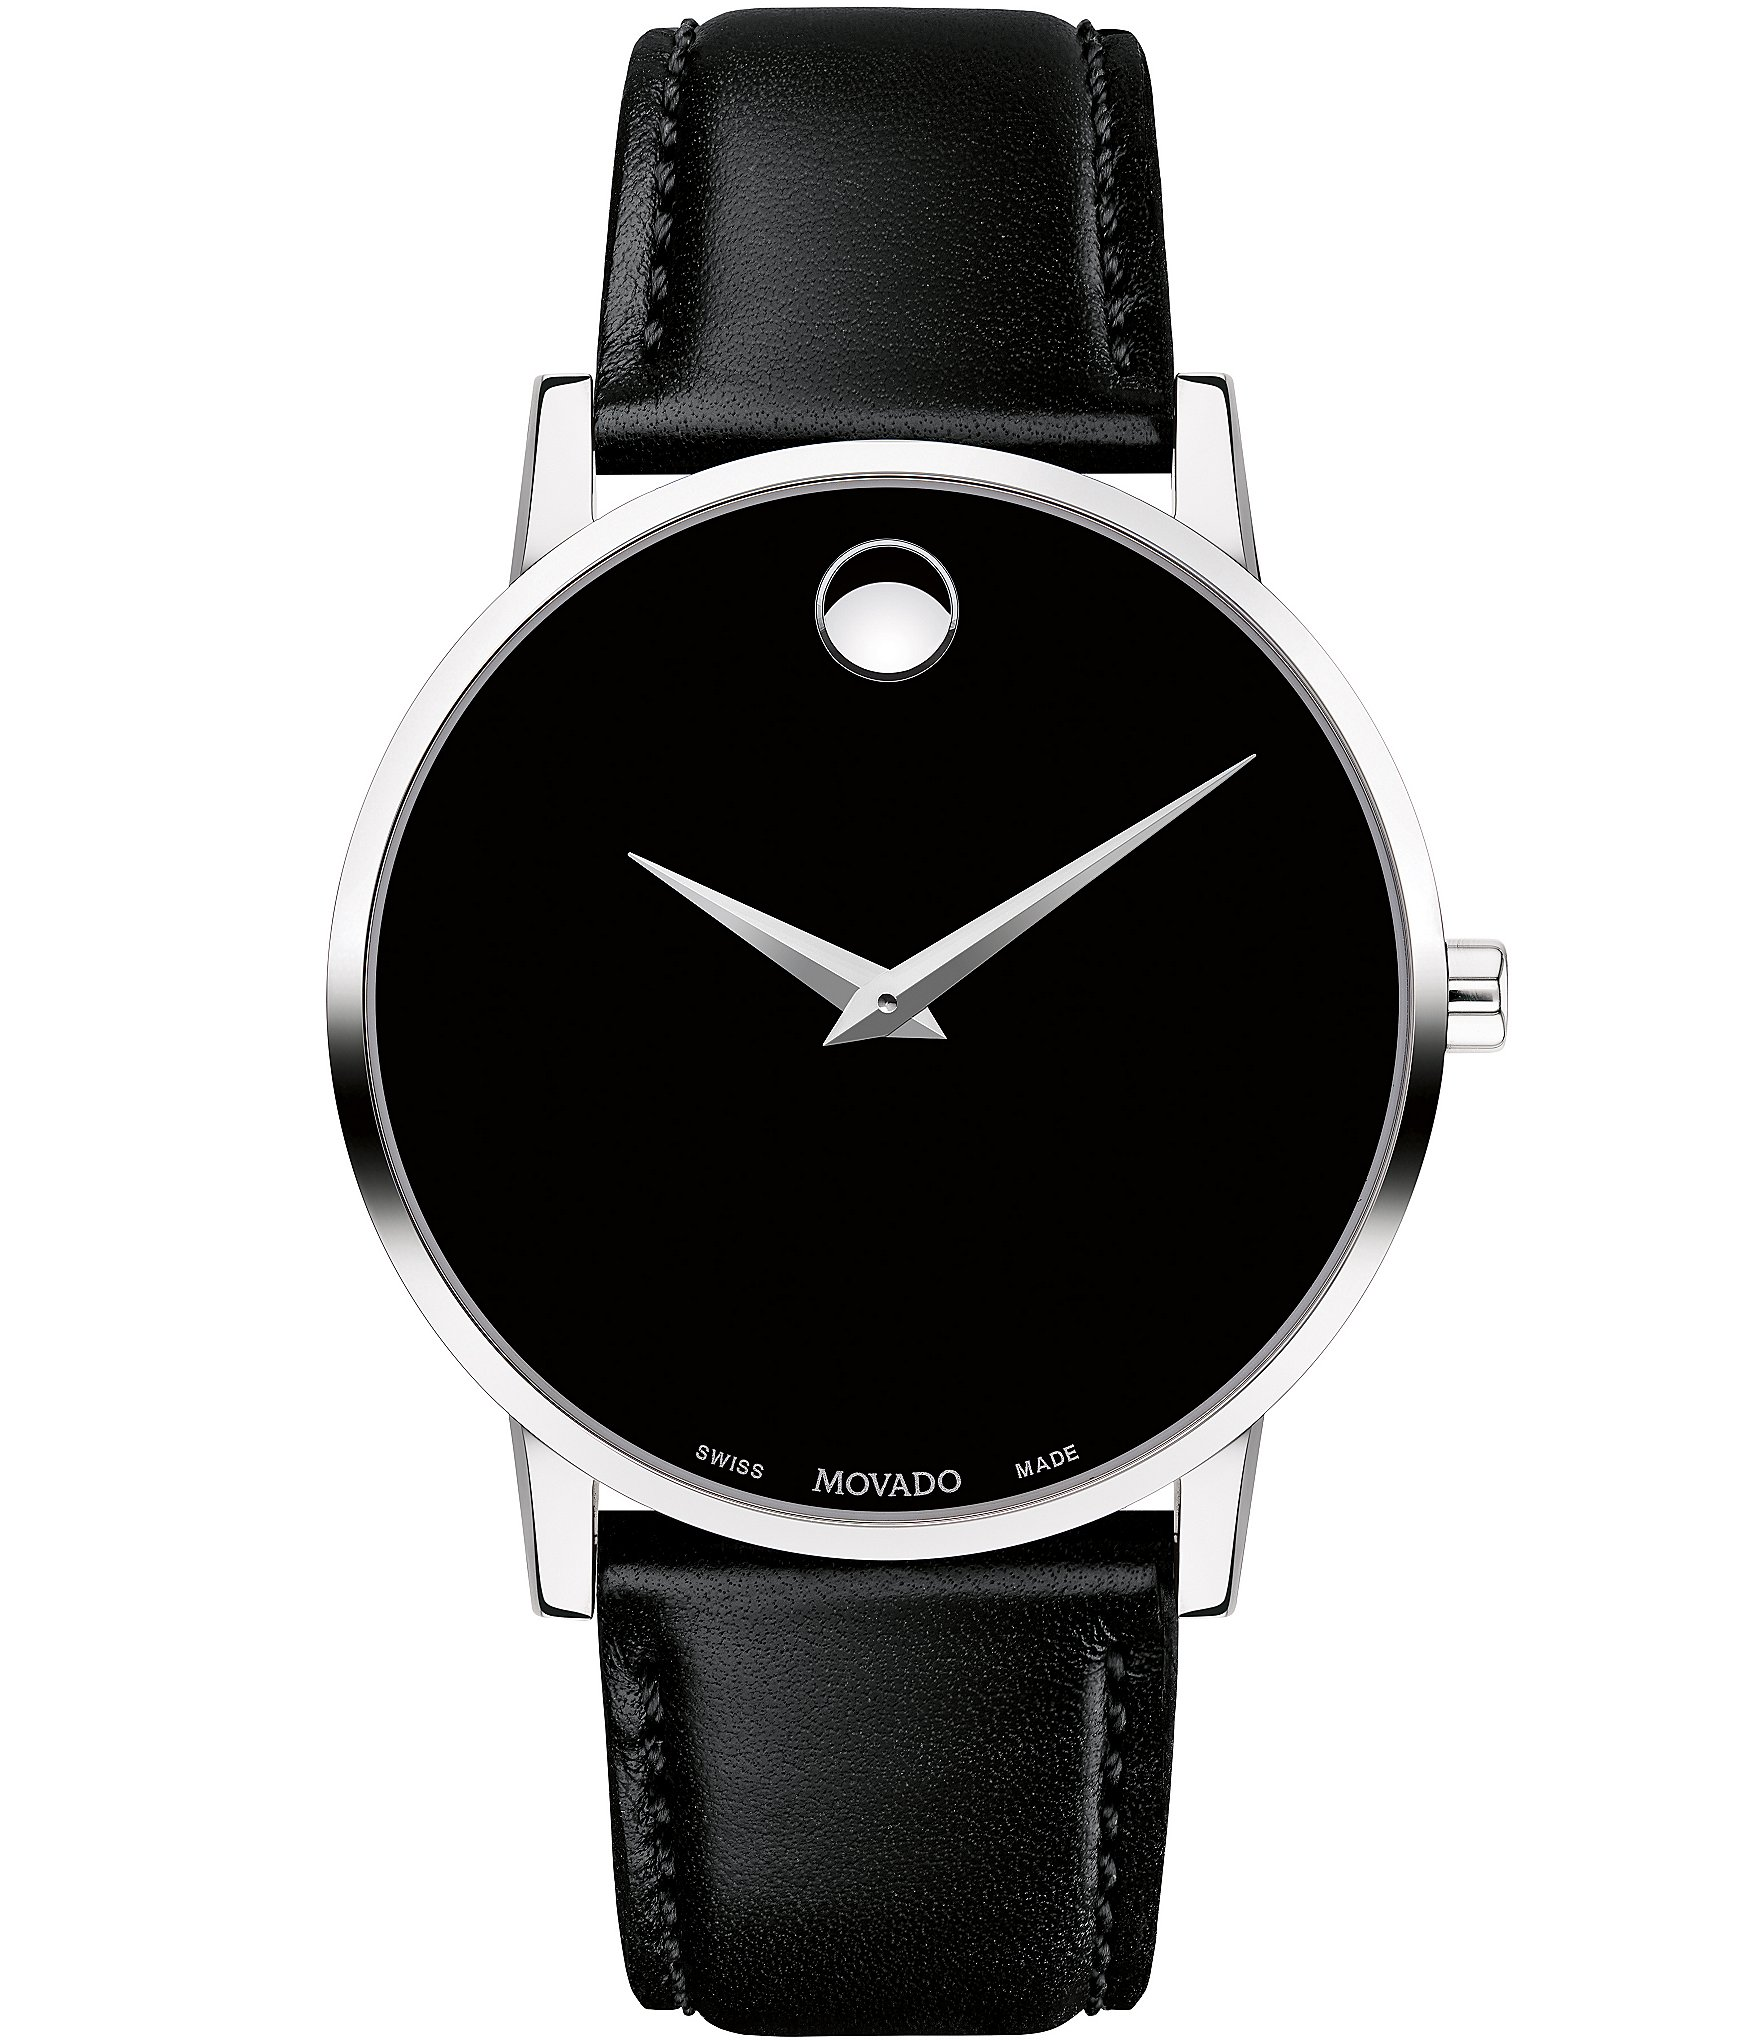 abd2f704a Movado Watches for Men & Women | Dillard's